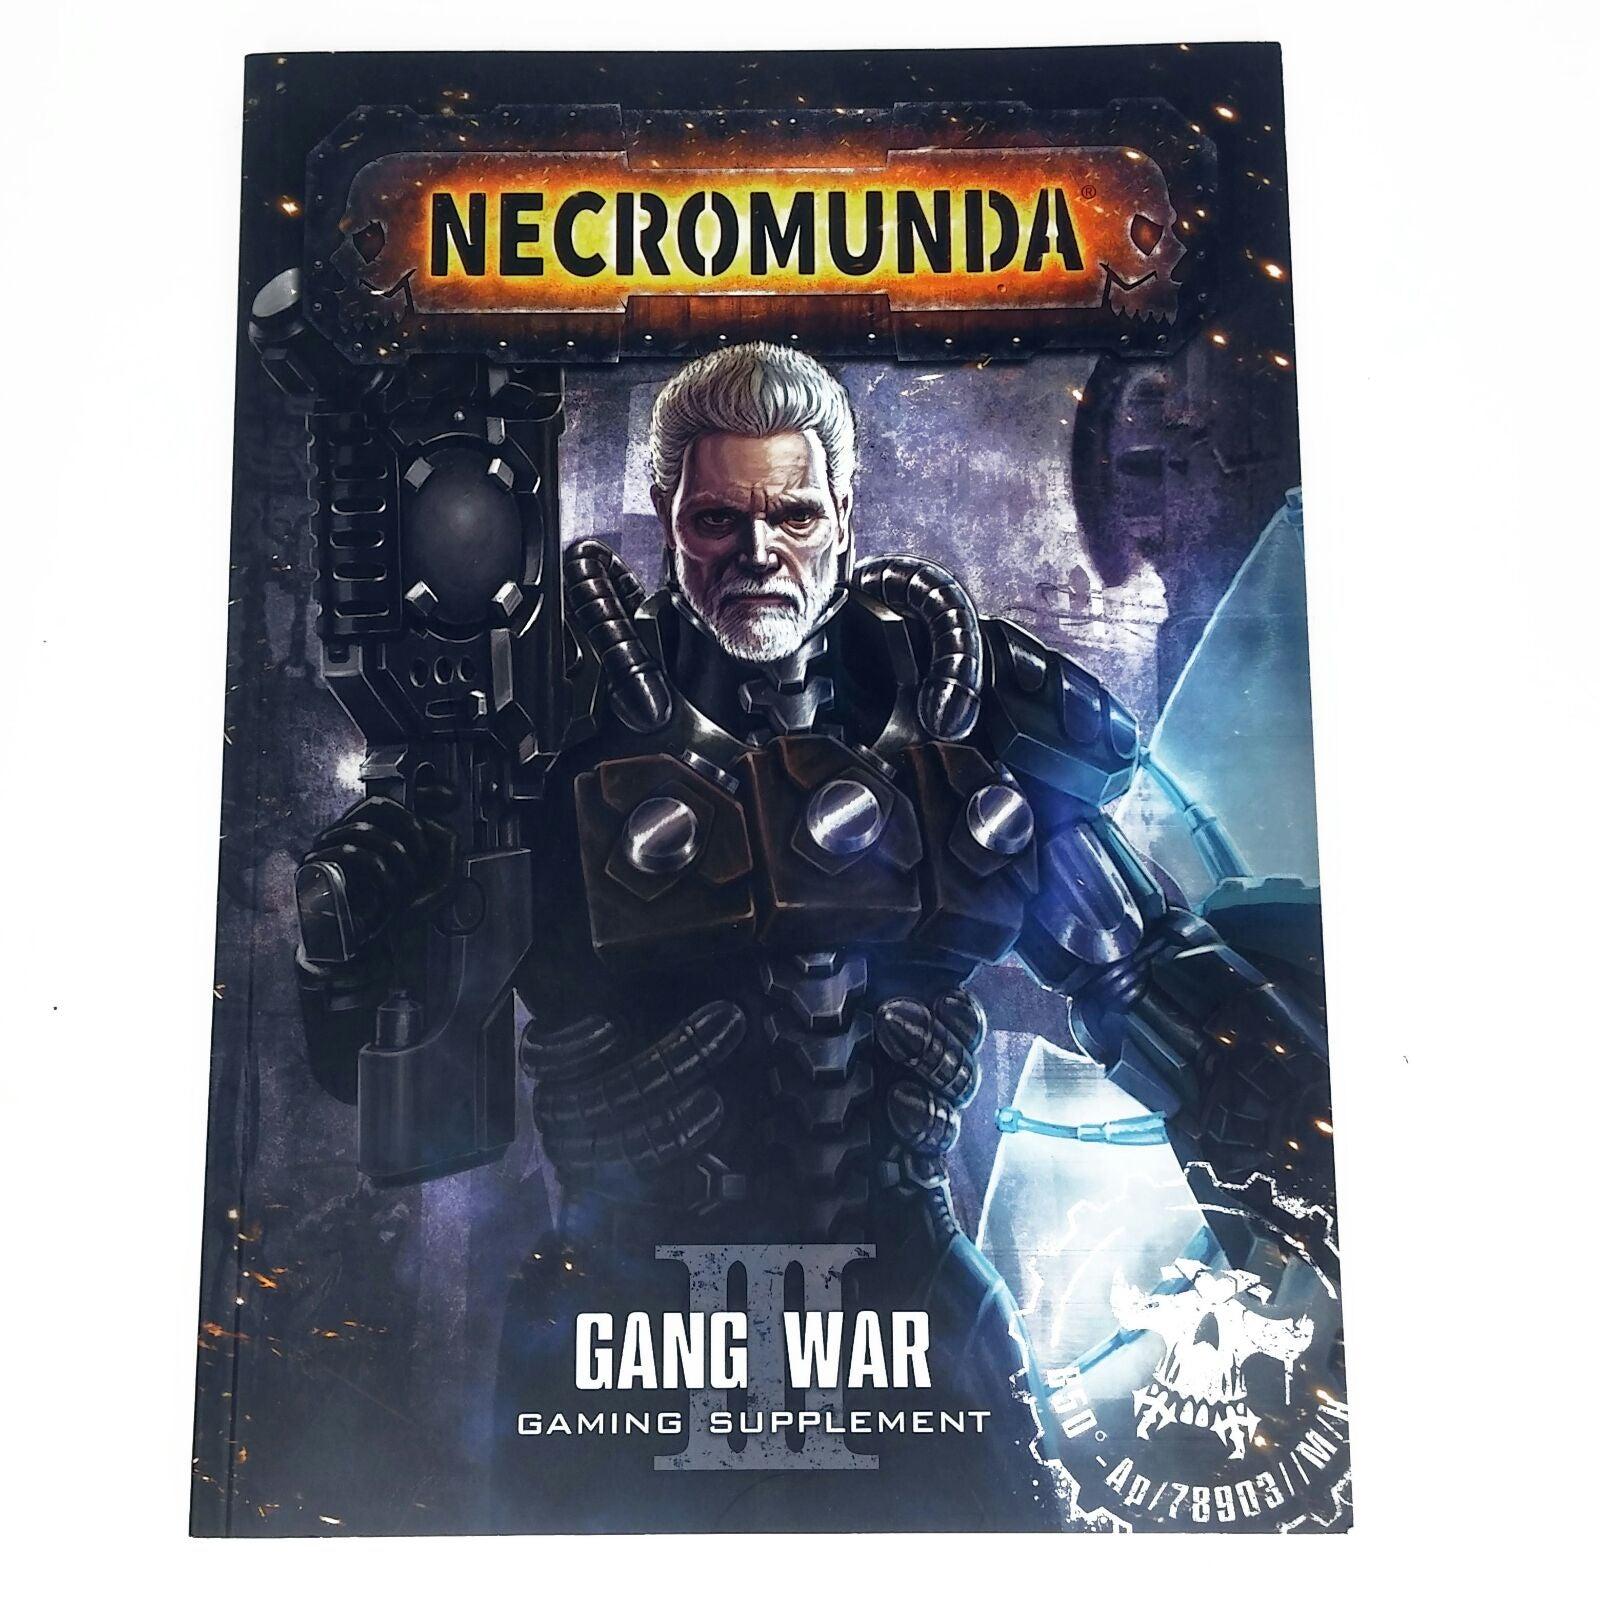 Necromunda Gang War 3 Gaming Supplement